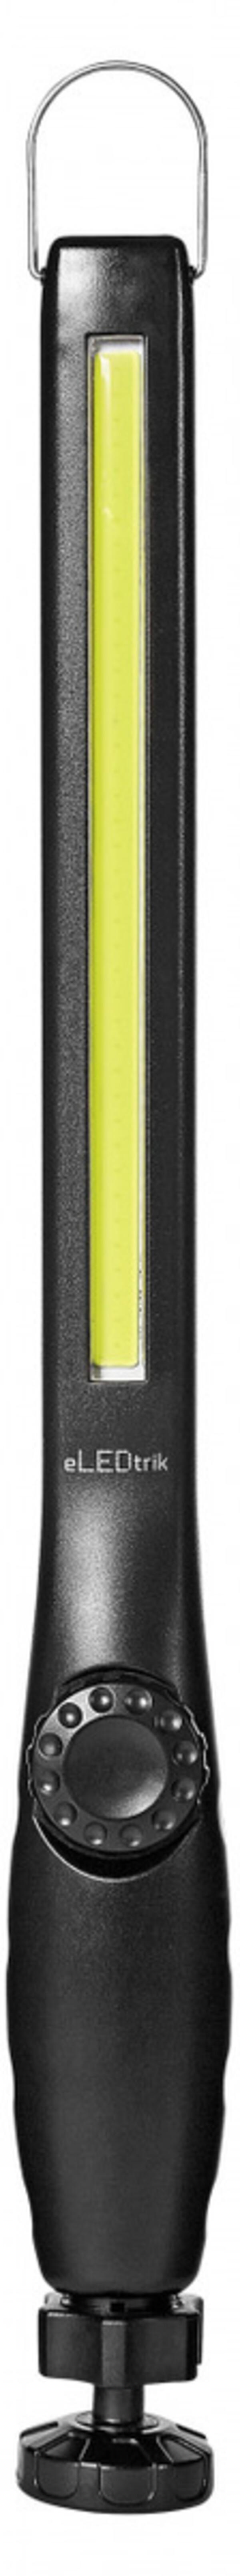 eLEDtrik LED Arbeitslichter, 5 W